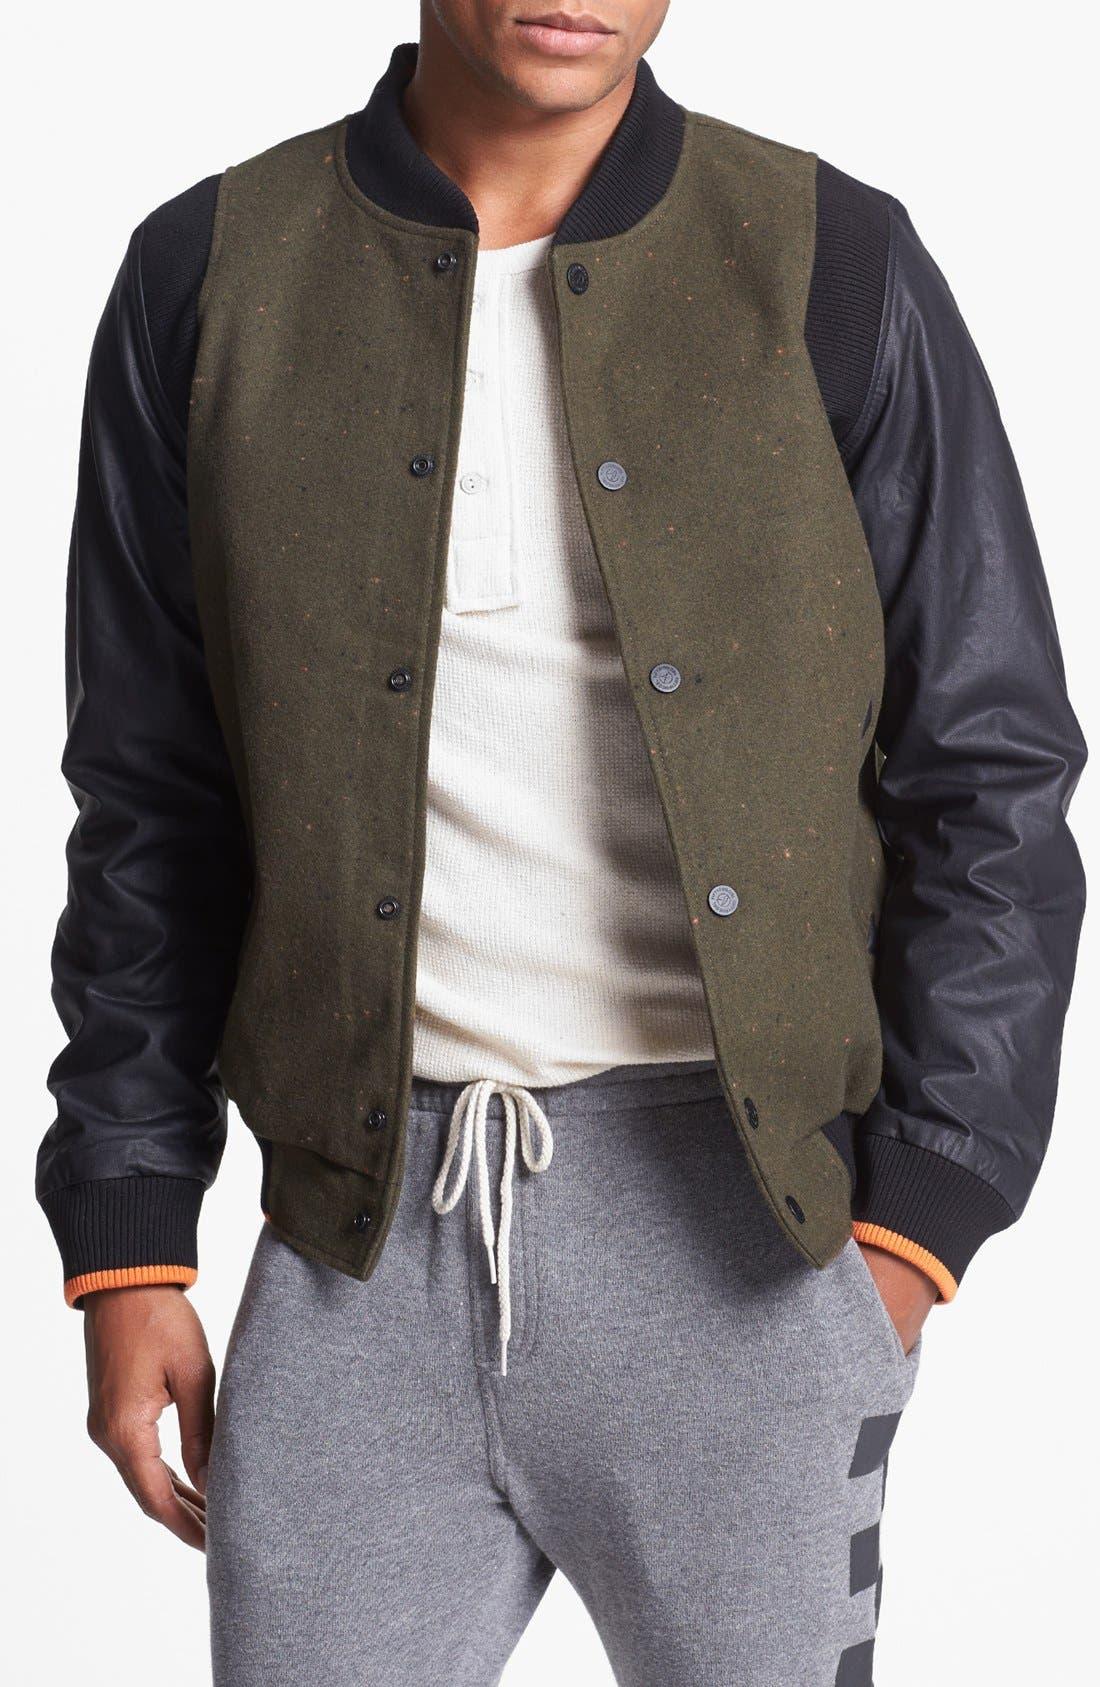 Alternate Image 1 Selected - 55DSL 'Jomstone' Varsity Jacket